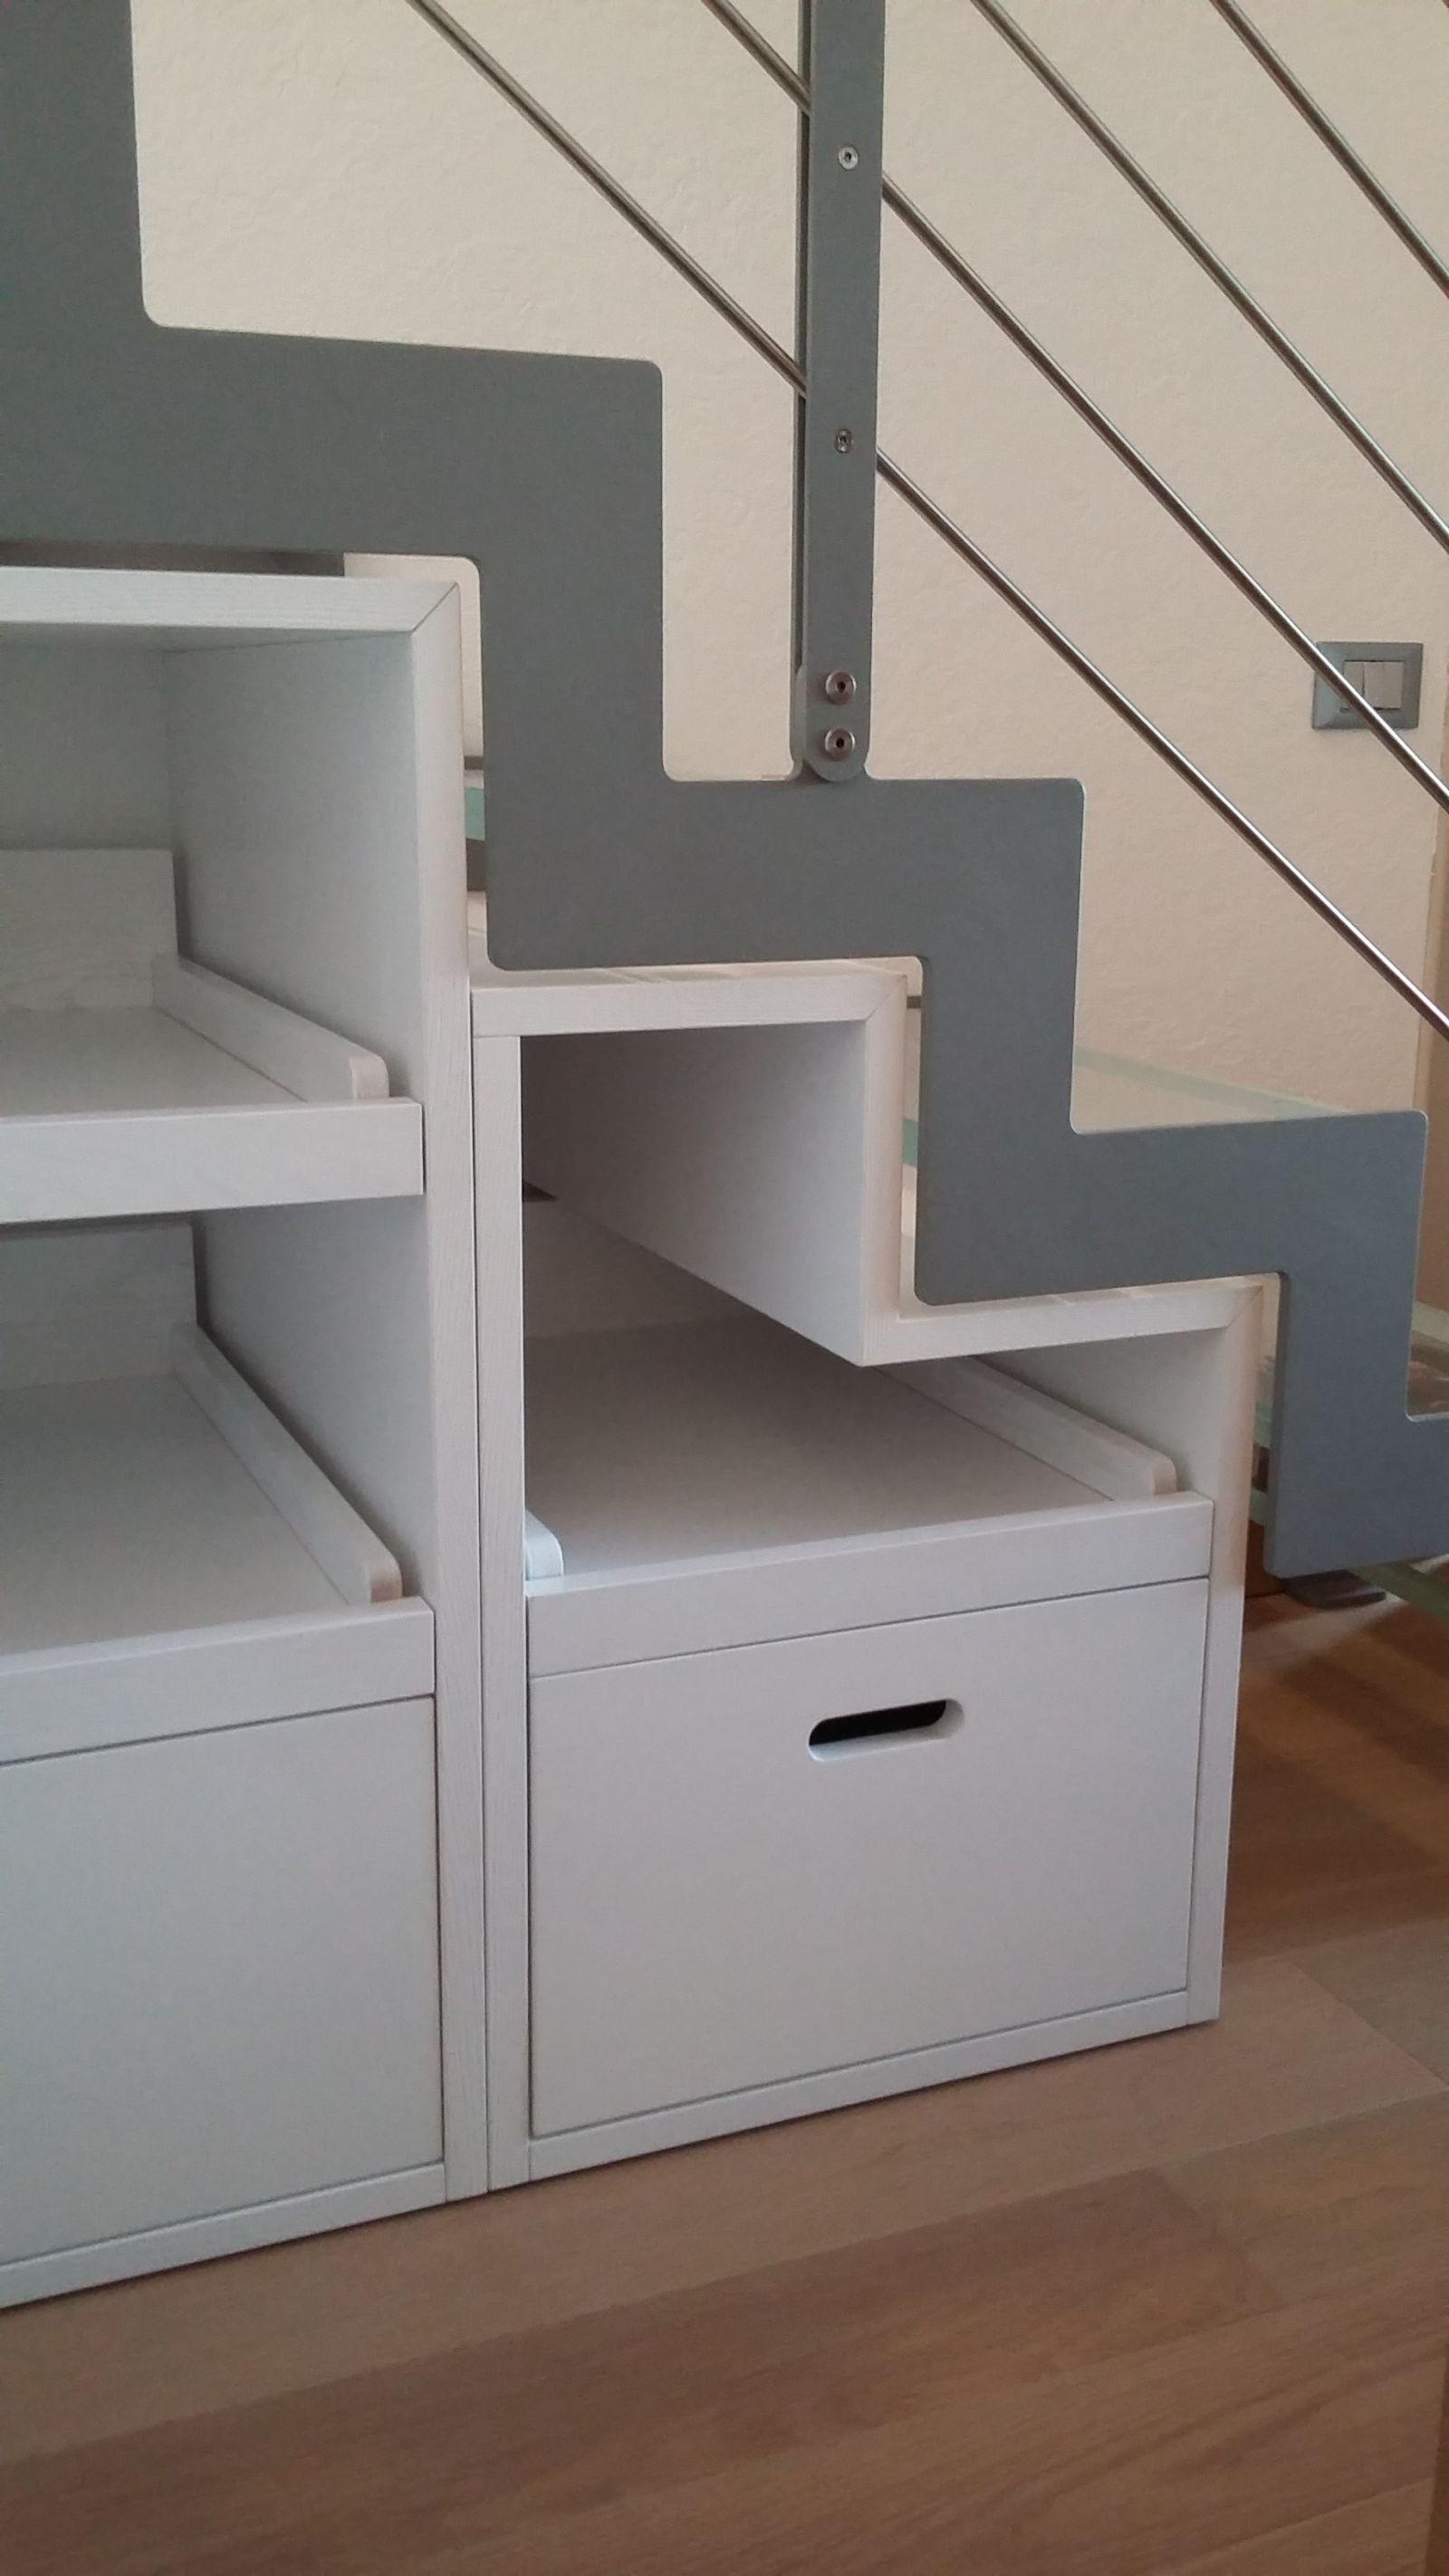 Mobile portabiancheria sporca ikea interno di casa - Mobili sottoscala ikea ...